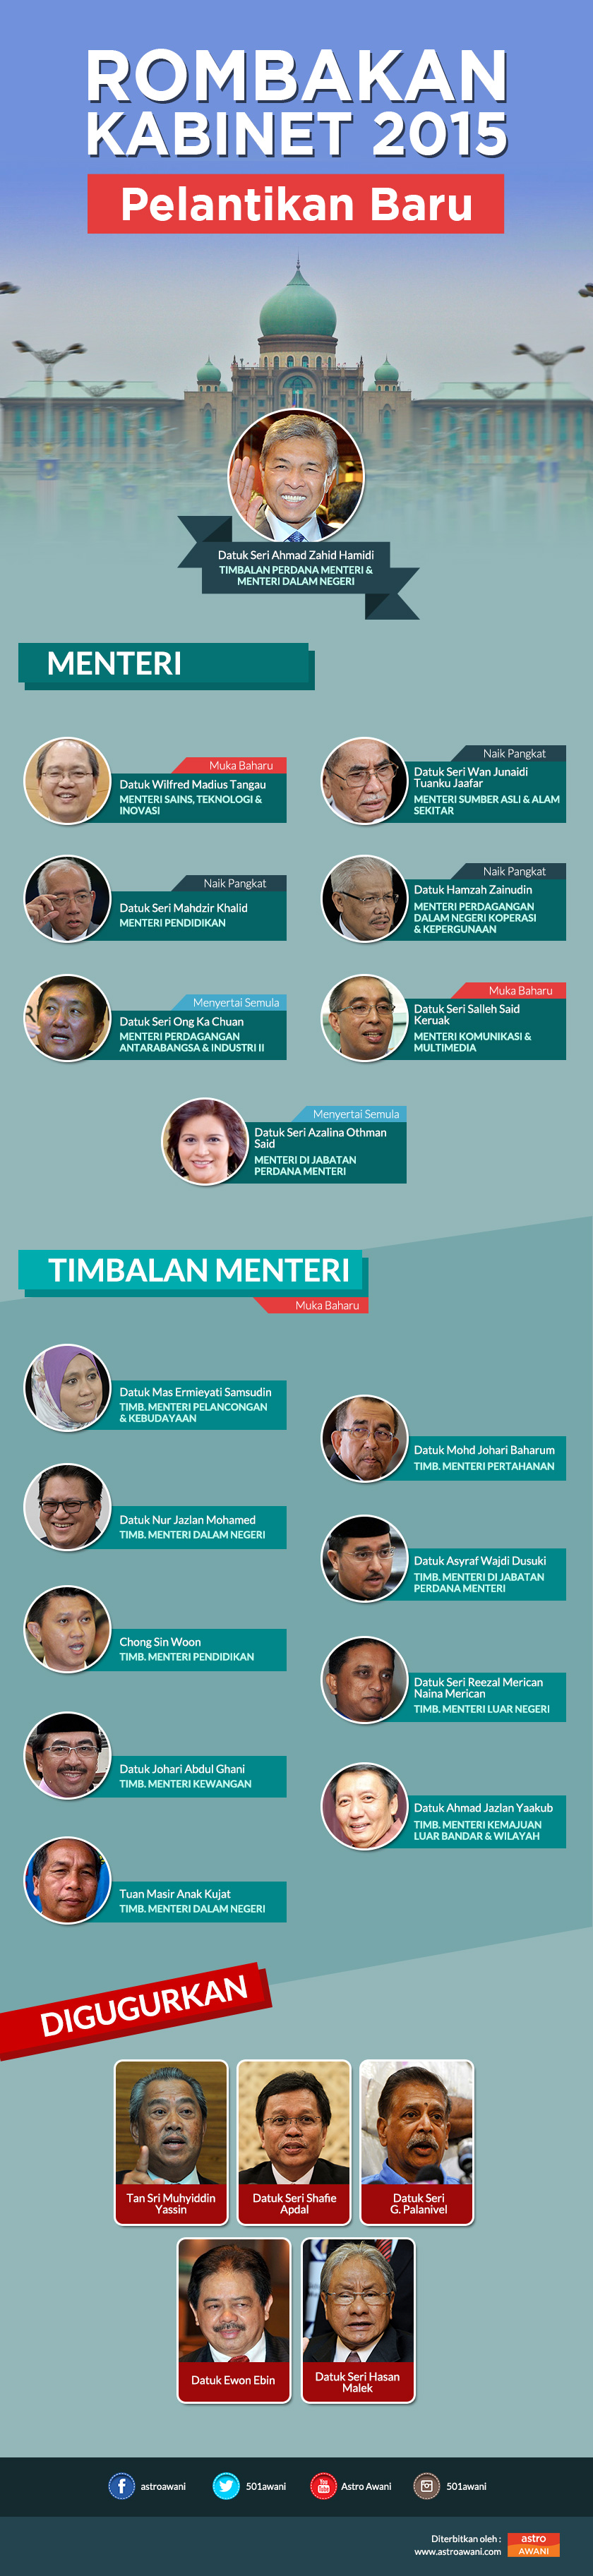 Rombakan Kabinet Malaysia 2015